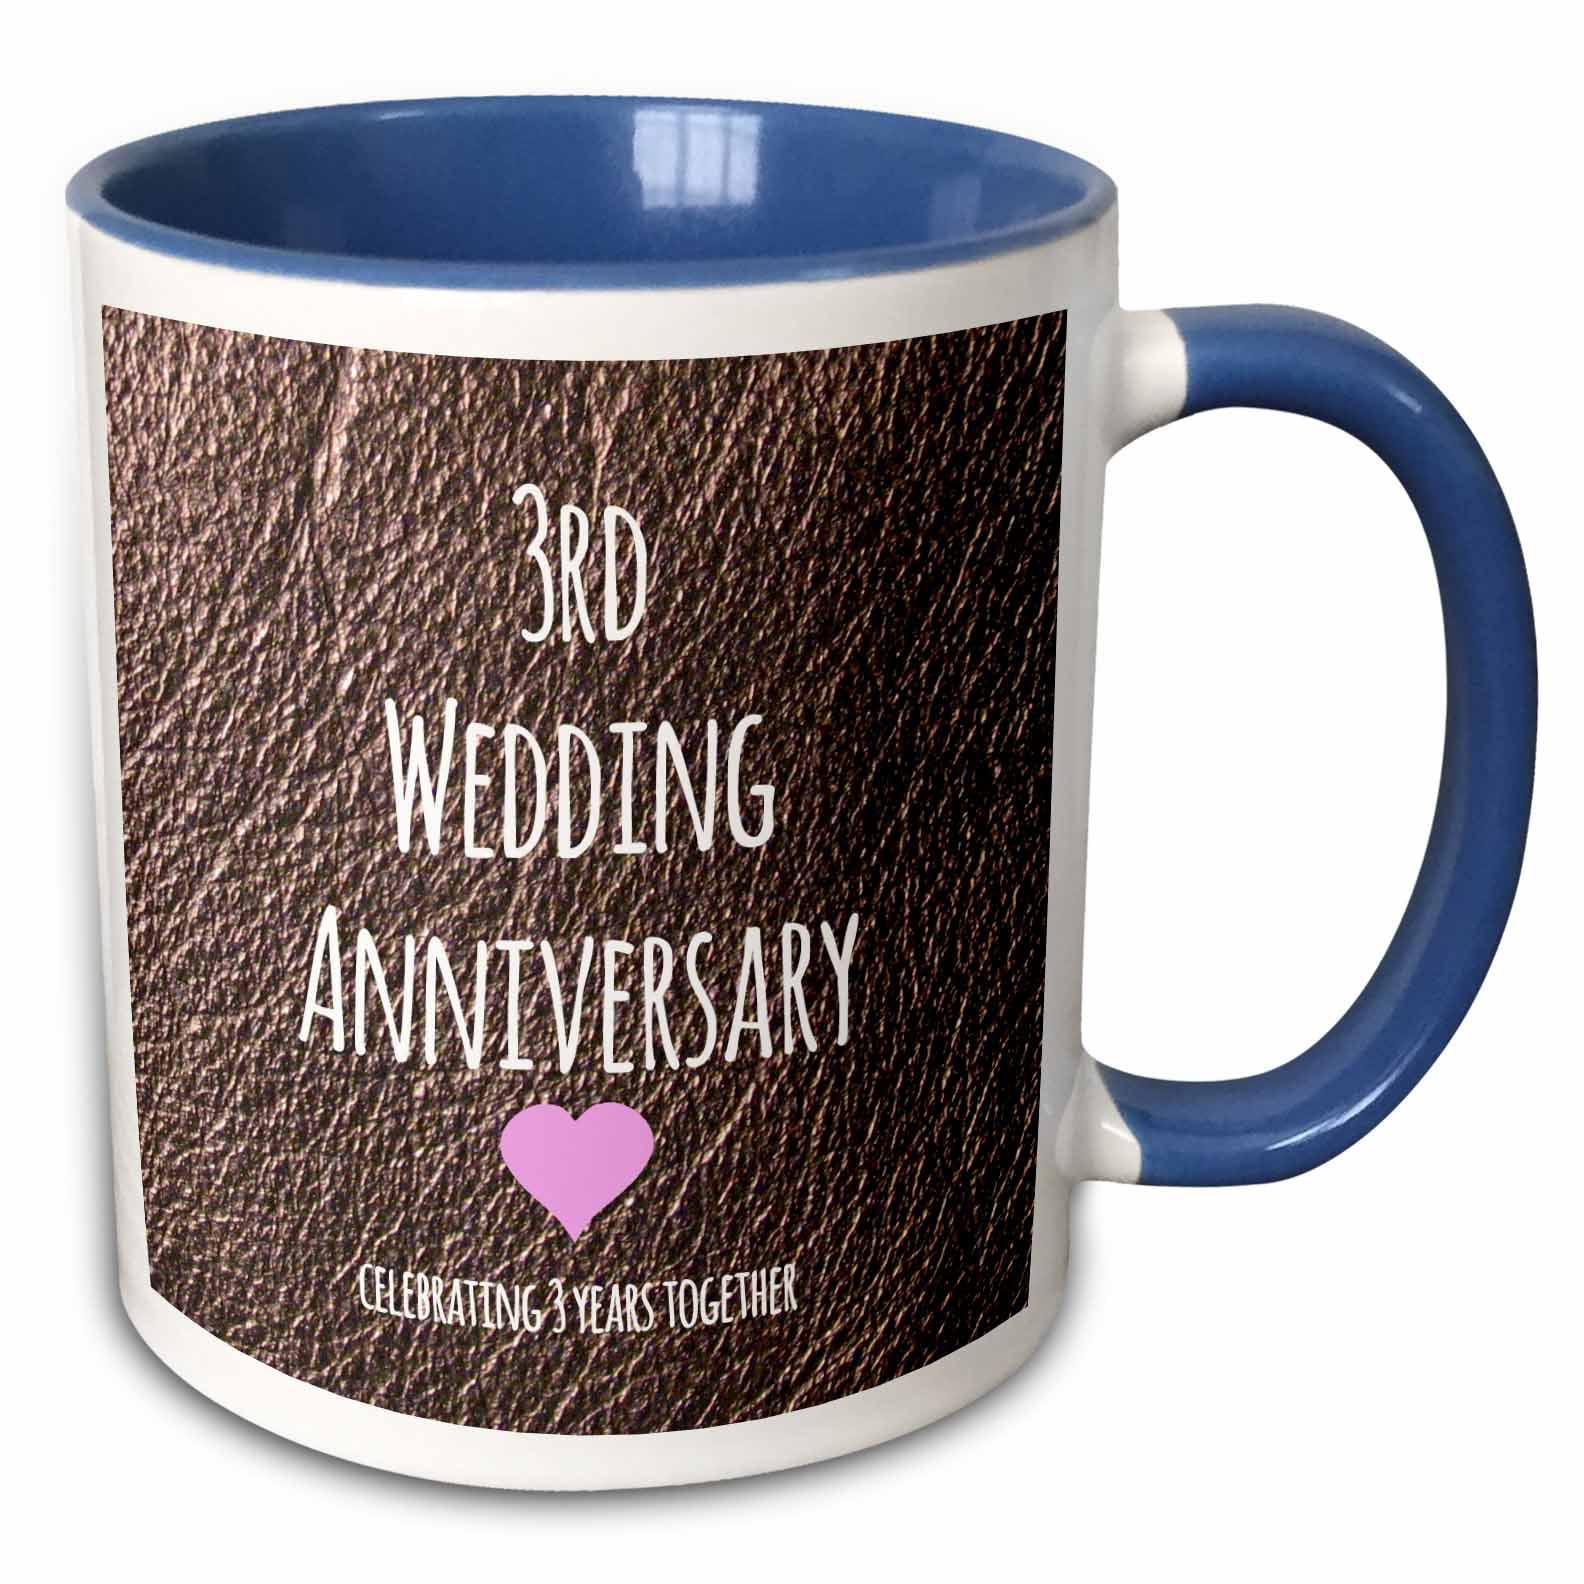 3drose 3rd Wedding Anniversary Gift Leather Celebrating 3 Years Together Third Anniversaries Three Yrs Two Tone Blue Mug 15 Ounce Walmart Com Walmart Com